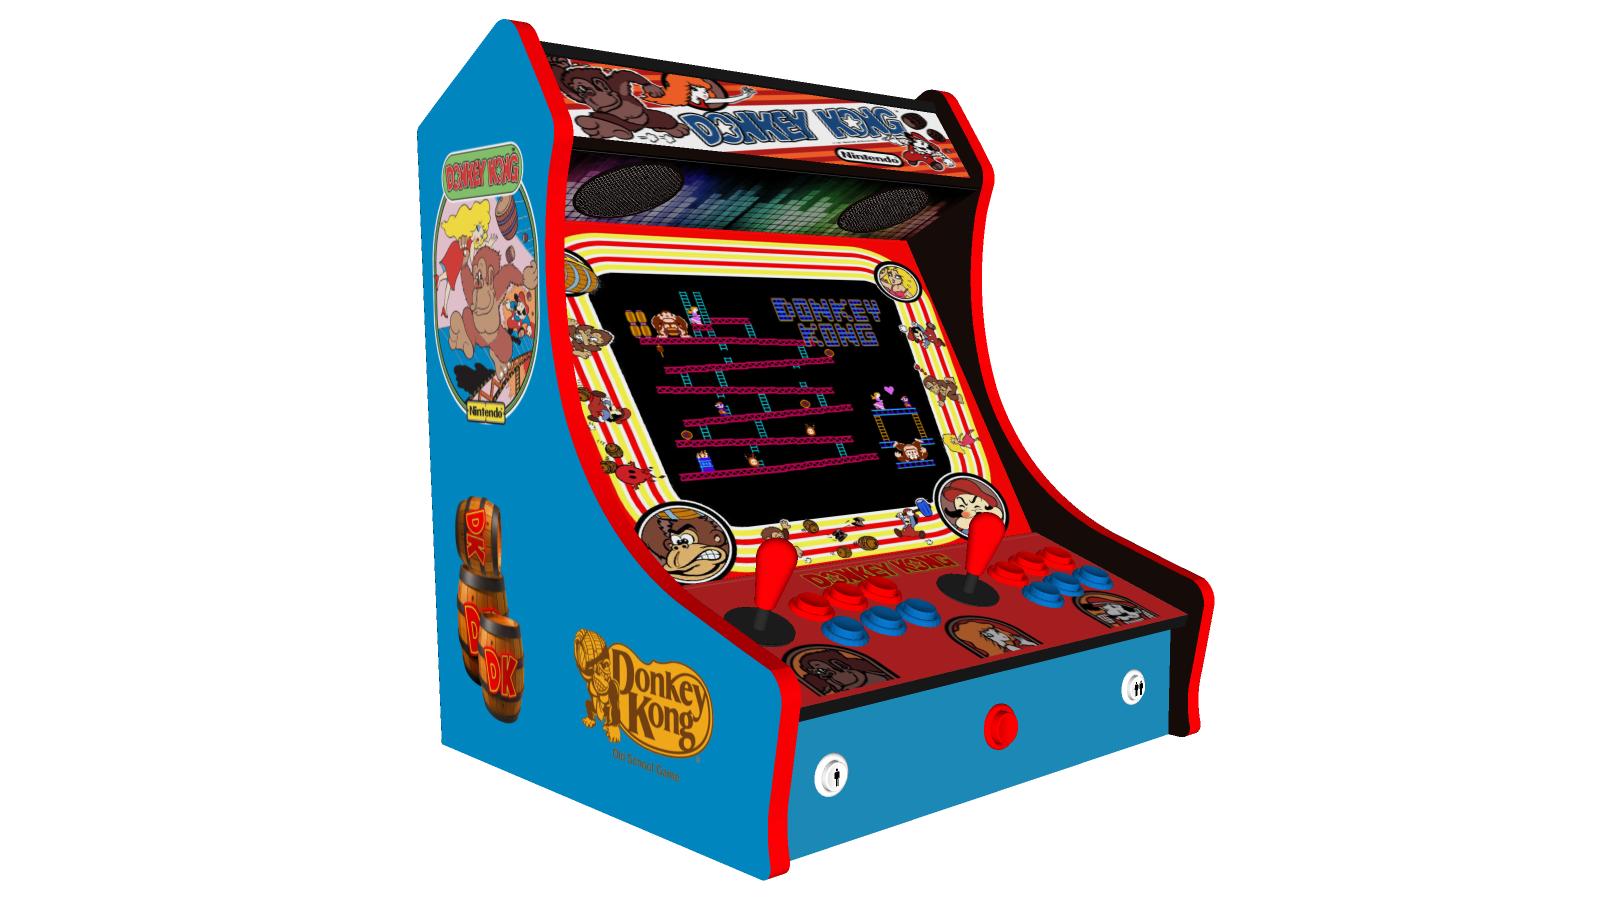 Old fashioned arcade games